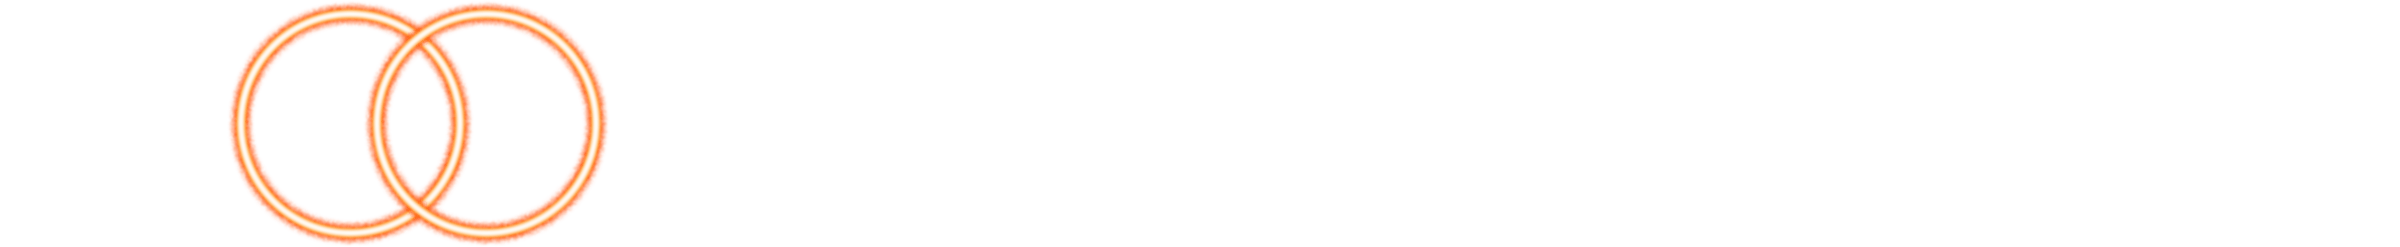 moons-logo4